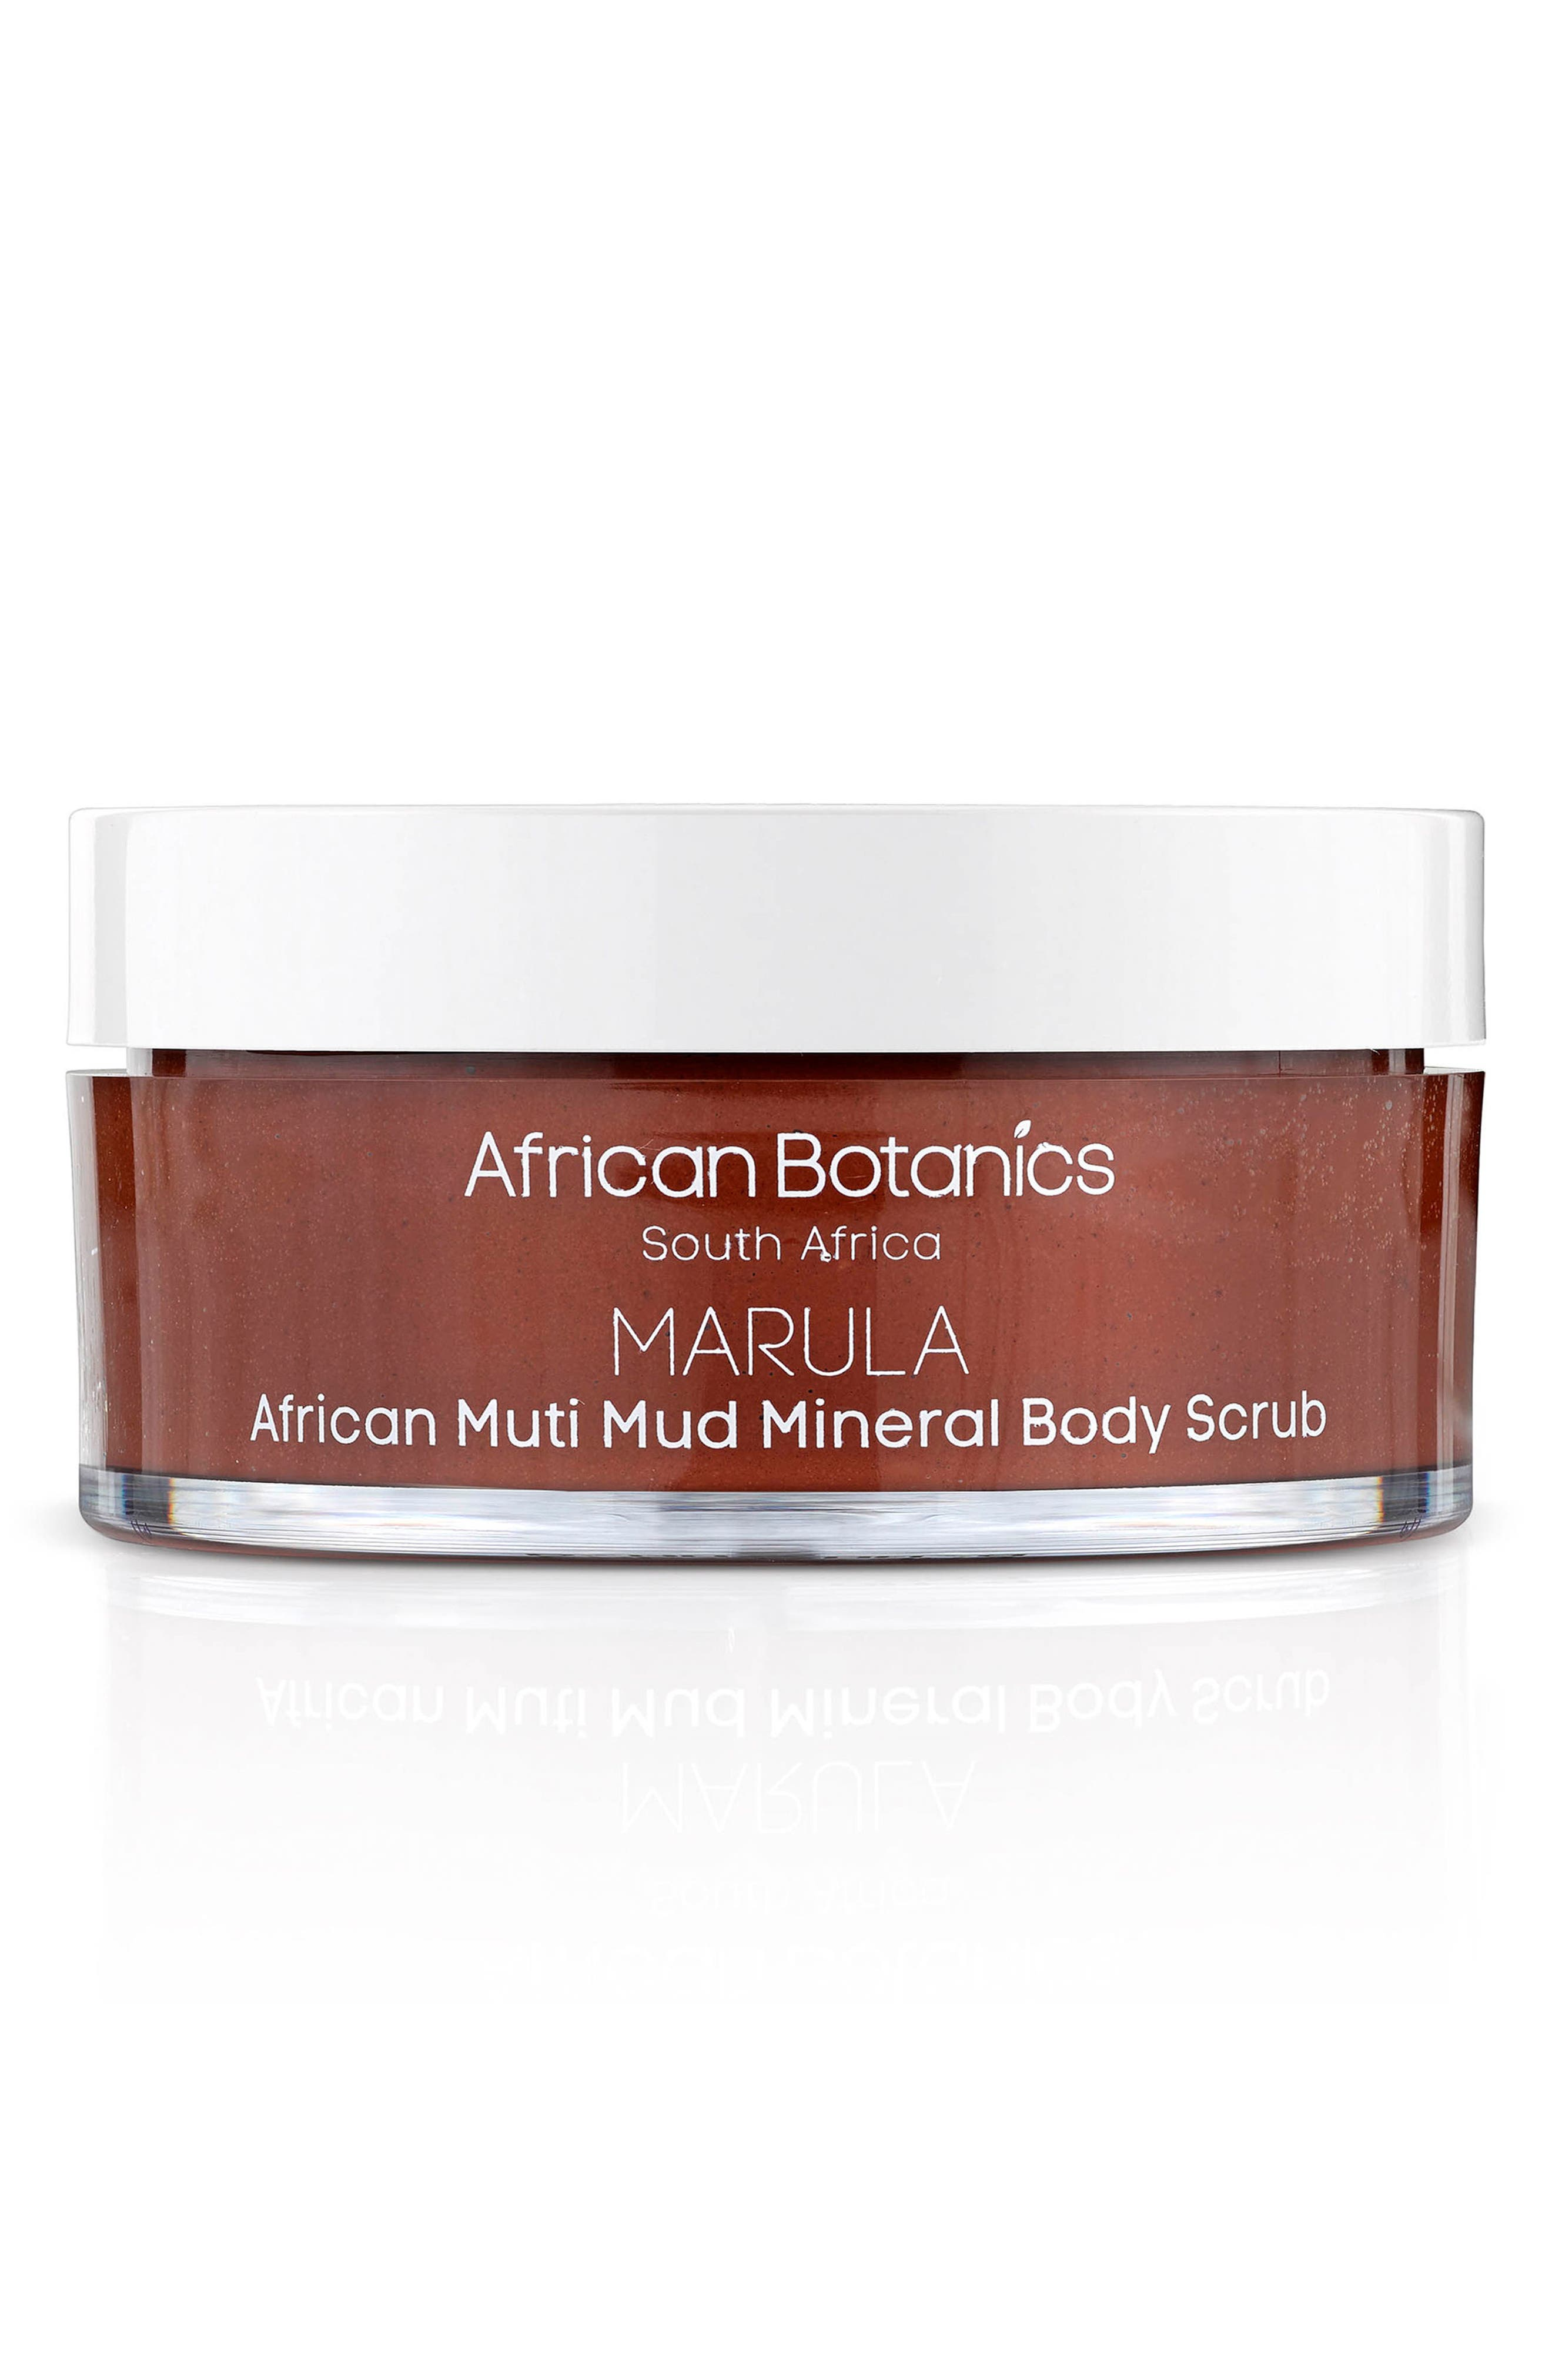 African Botanics African Multi Mud Mineral Body Scrub